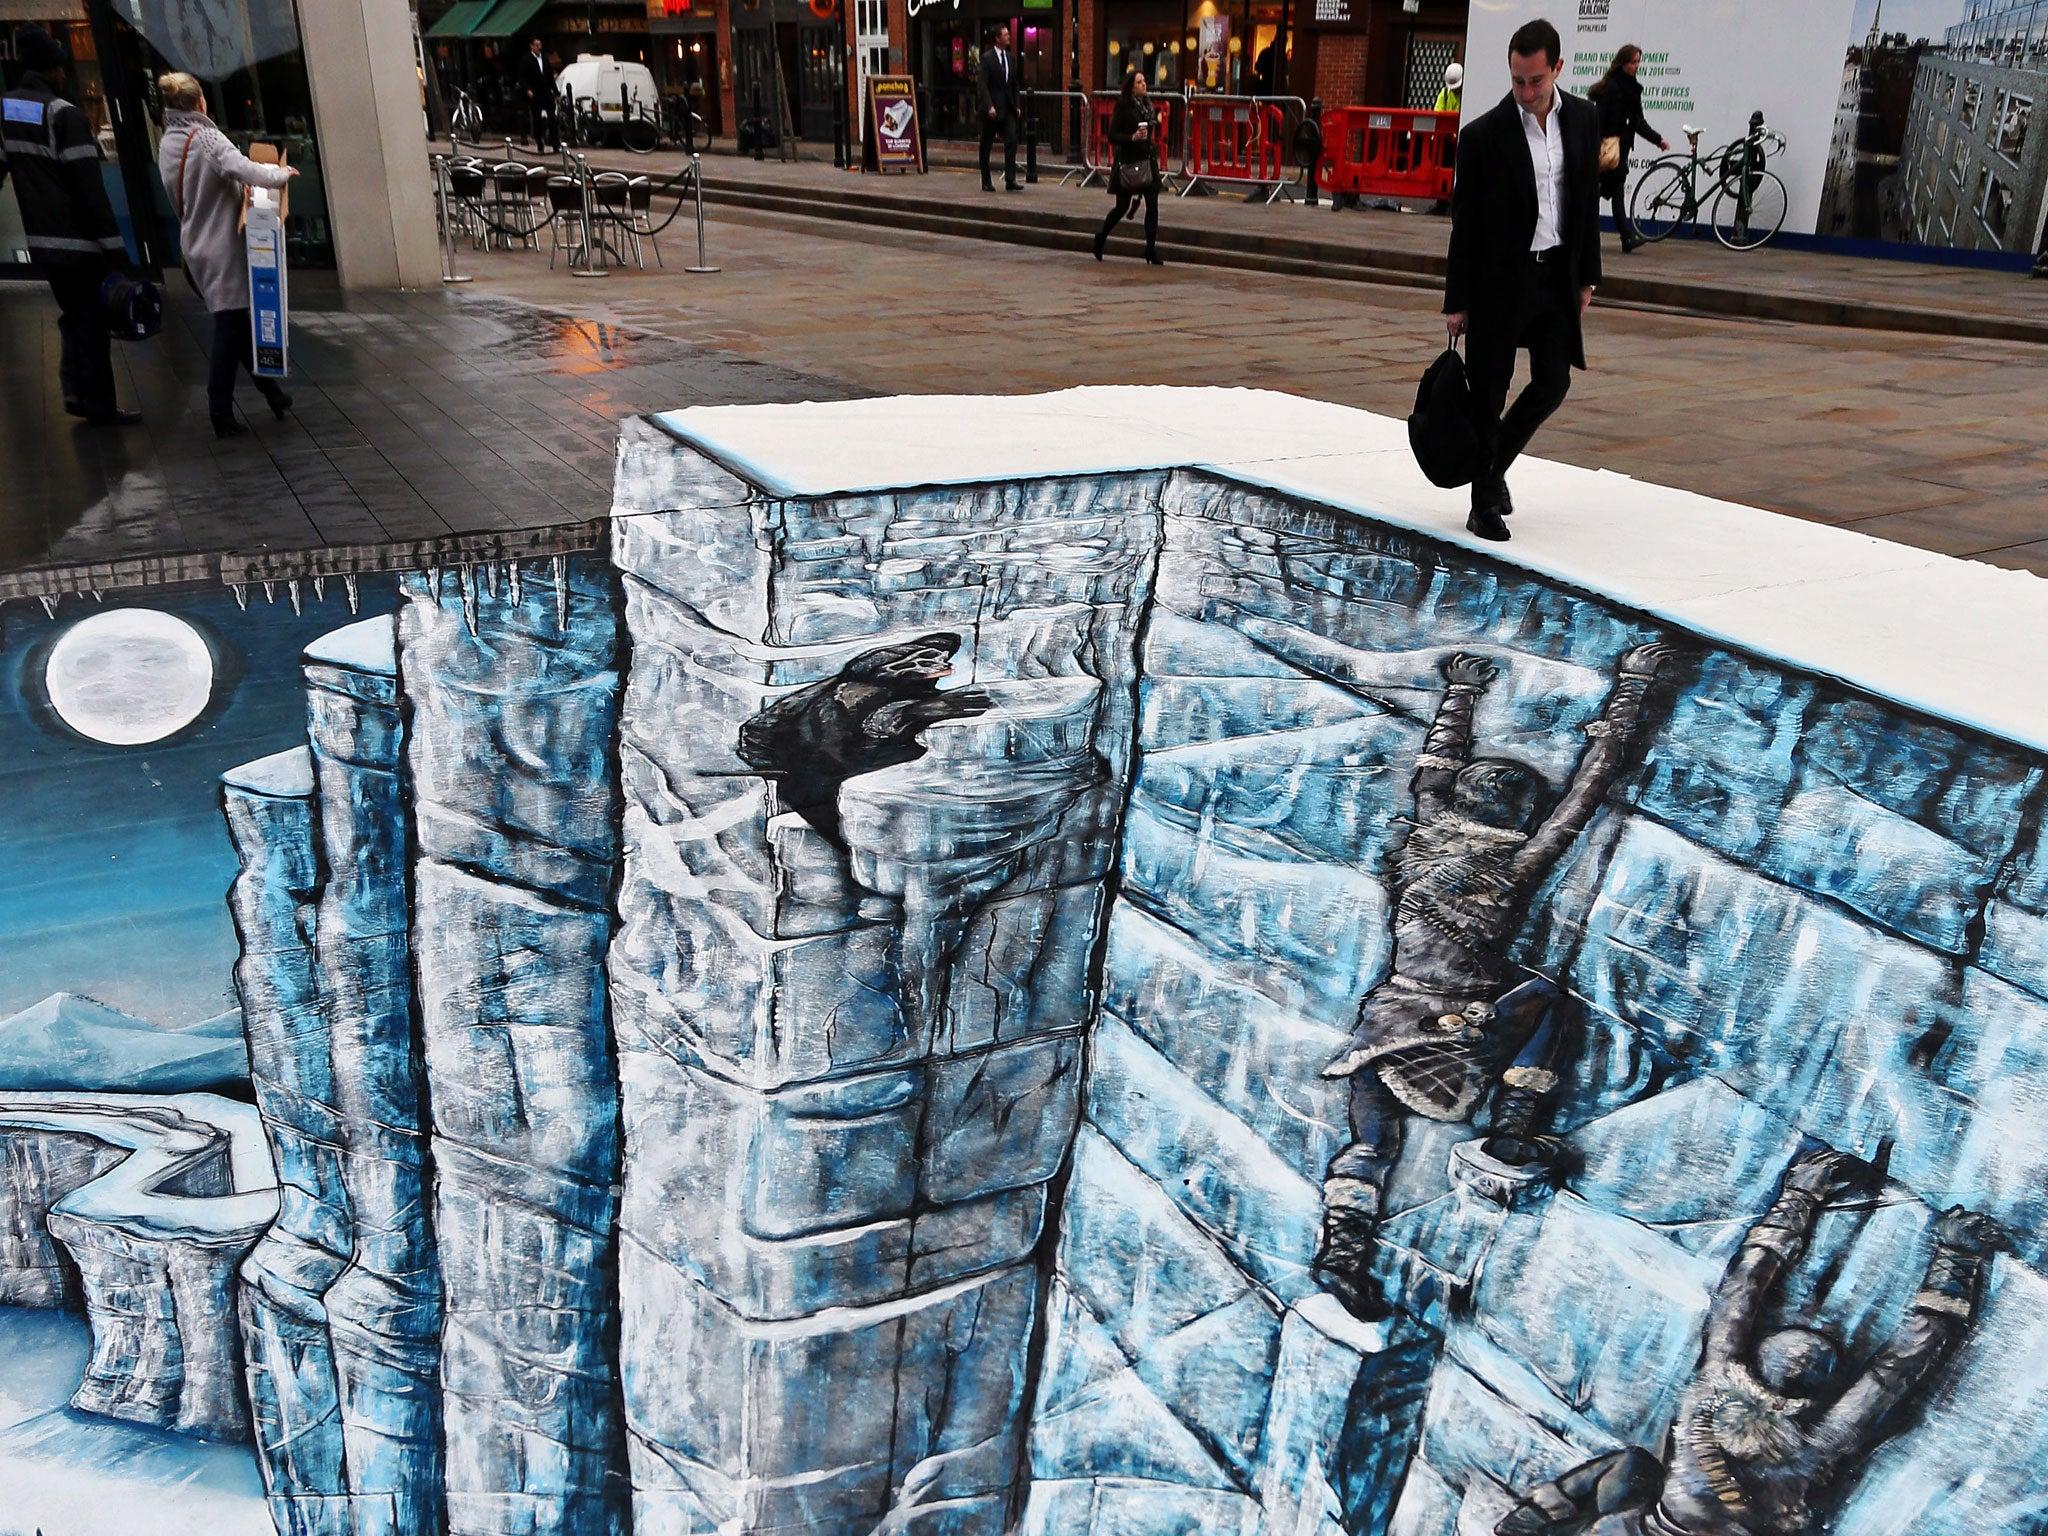 Game Of Thrones Wall Art game of thrones 'wall' recreated as 3d street art installation in